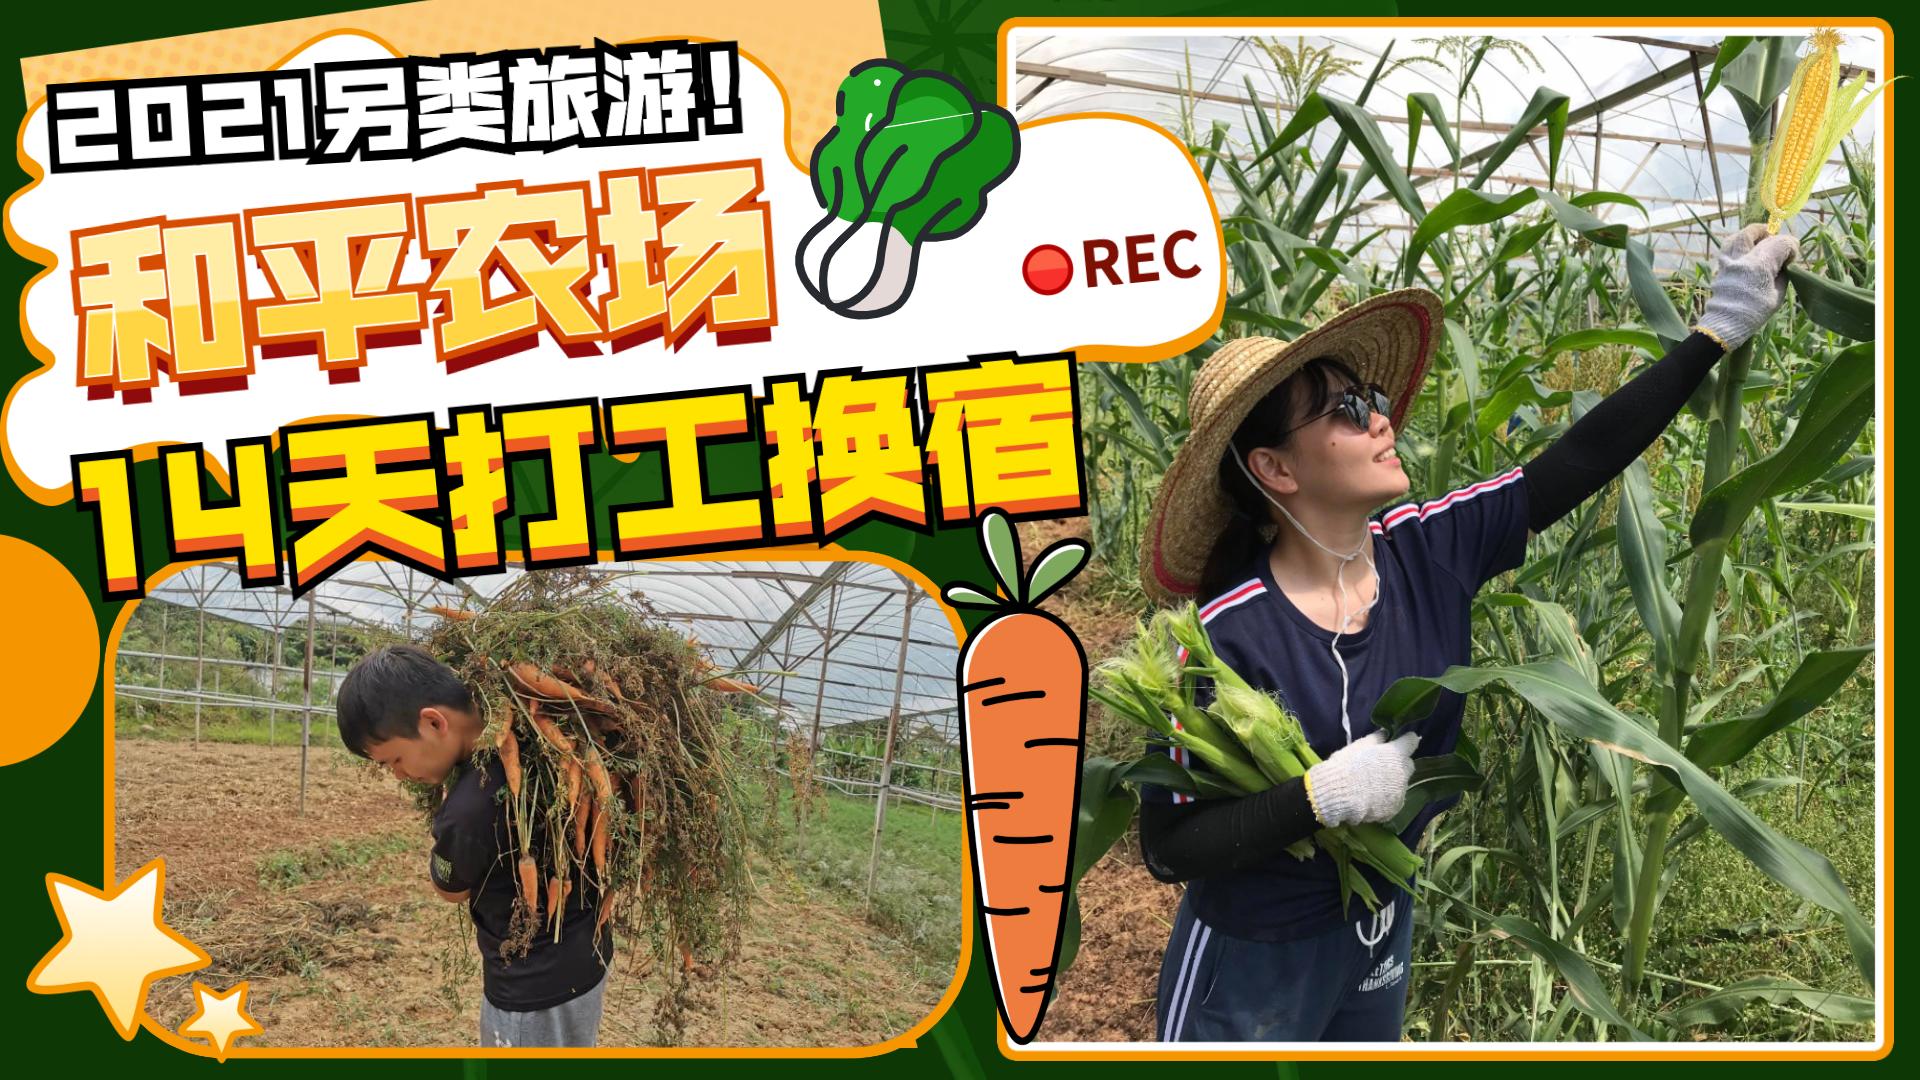 You are currently viewing 【金马仑和平农场 Terra Farm打工体验】3分钟内带你了解 14天打工换宿&收割蔬菜真实情况!